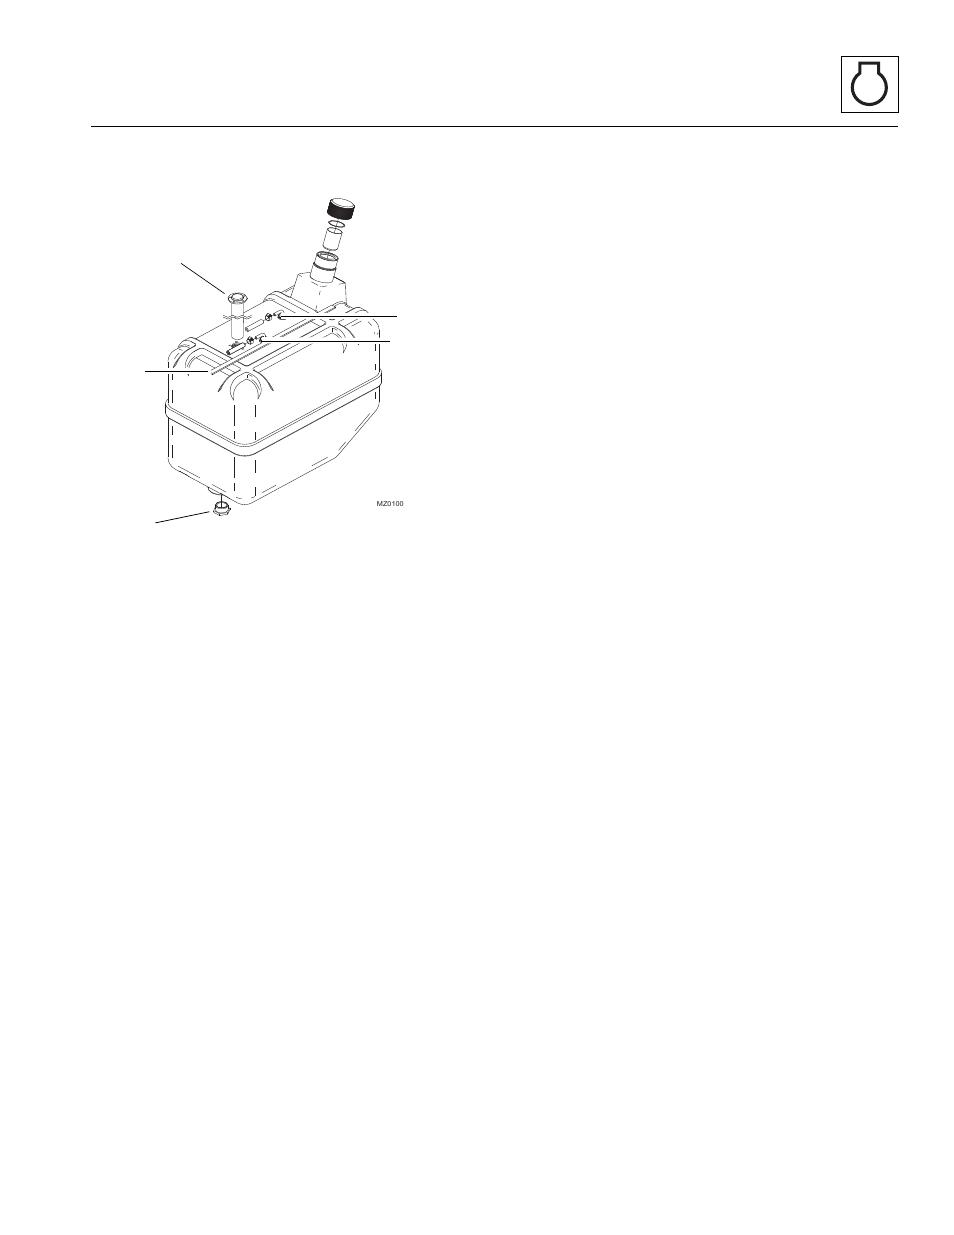 2 fuel tank, Fuel tank | JLG 4017 Service Manual User Manual